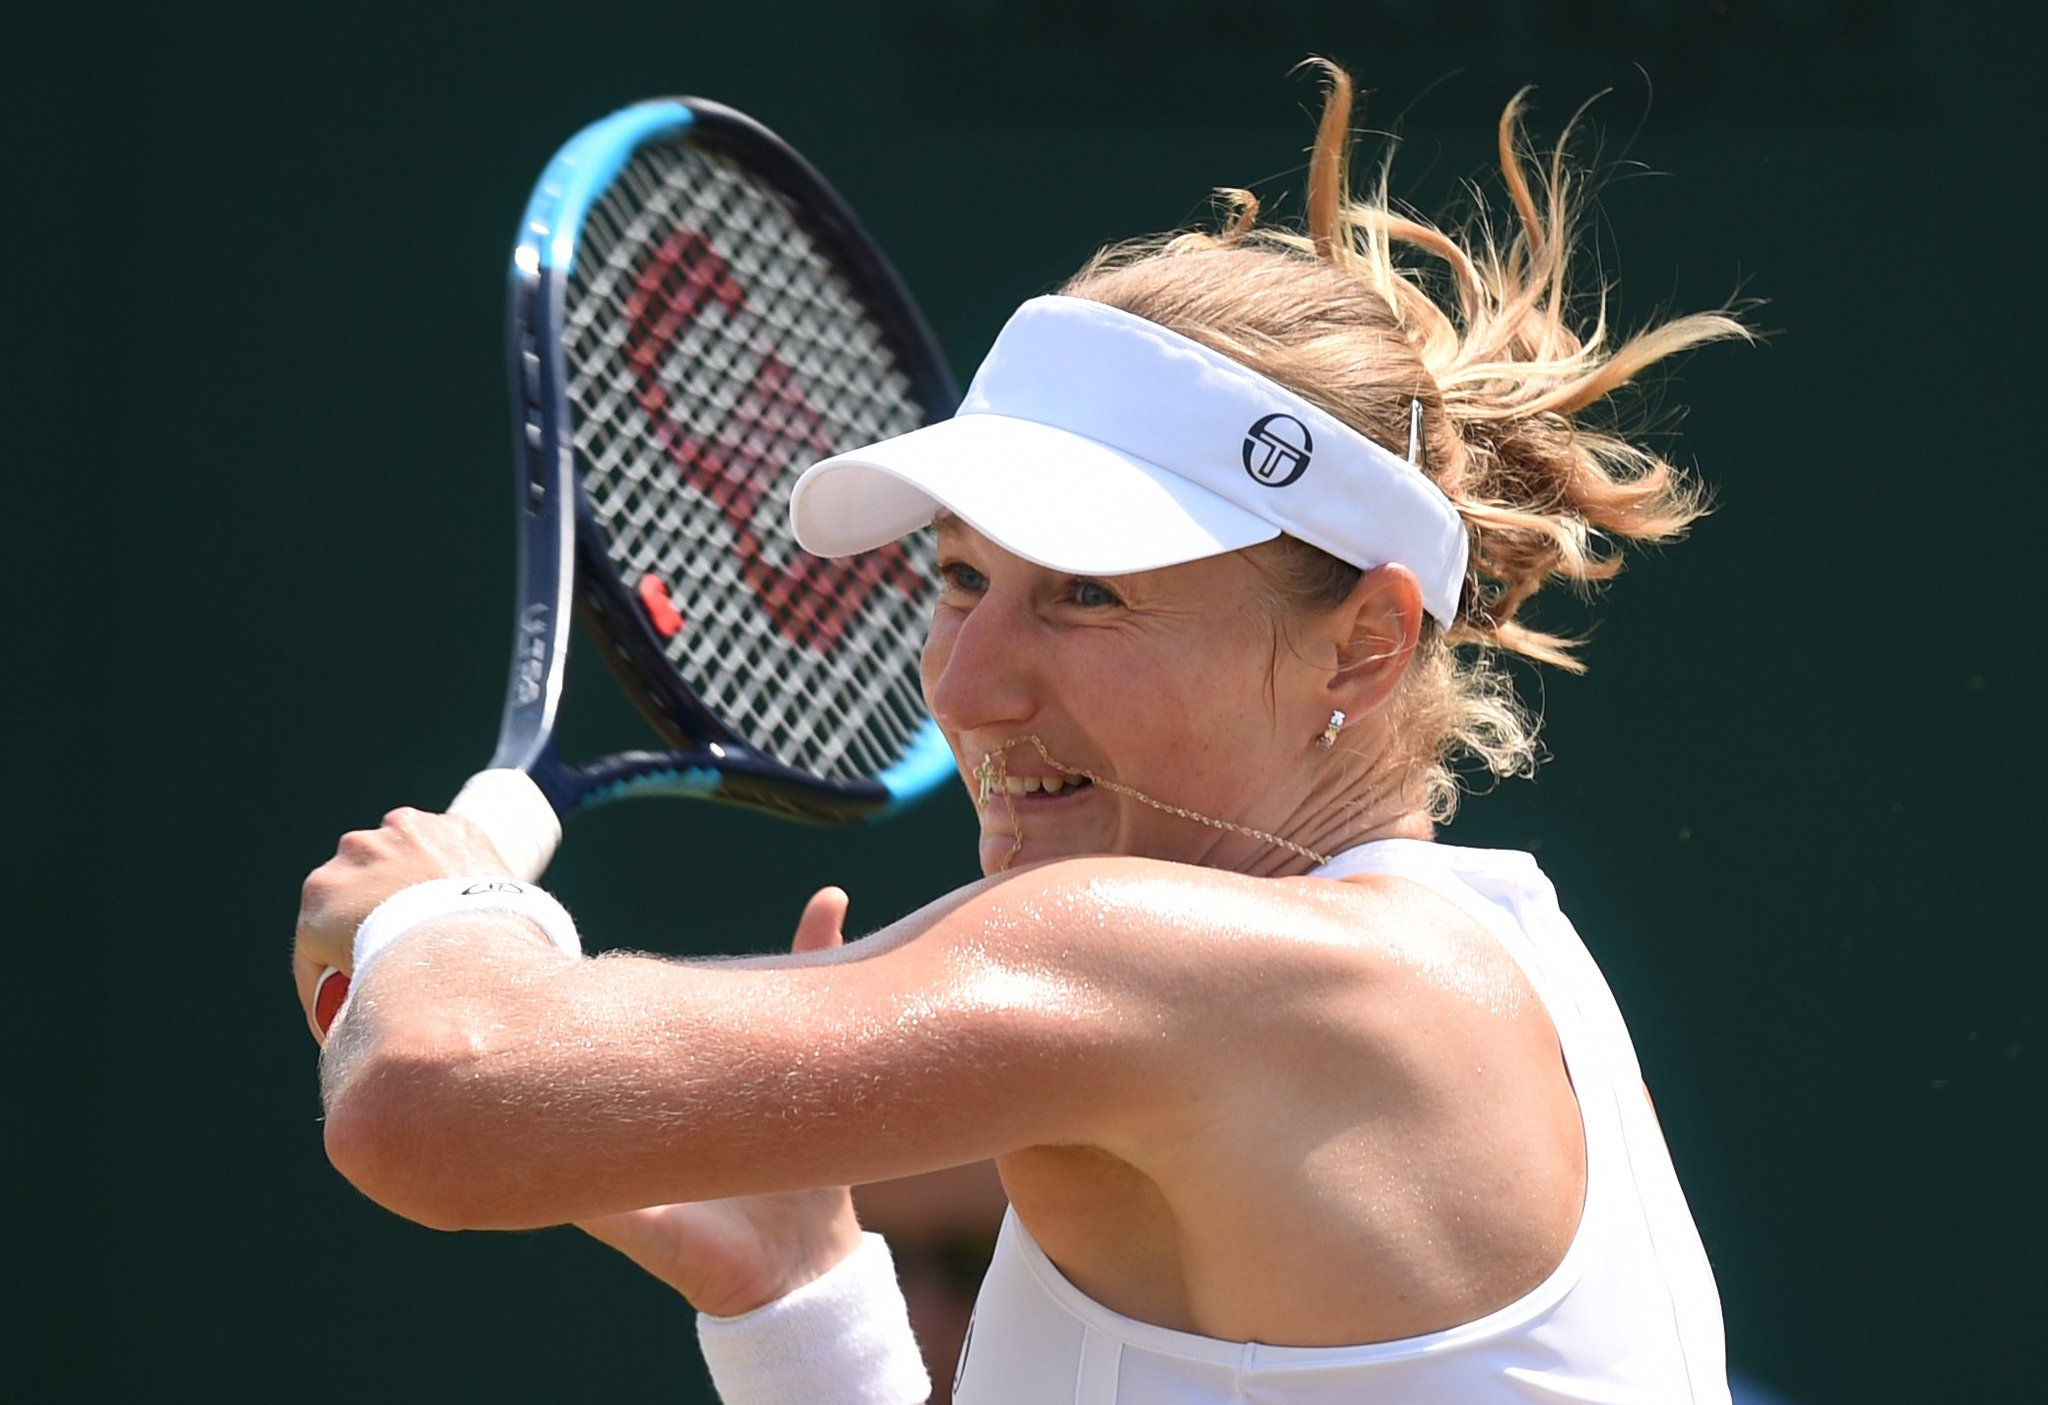 The @Wimbledon mixed doubles quarterfinal match-ups are set--> https://t.co/EUSQKJwjiq https://t.co/upv58Bjedk